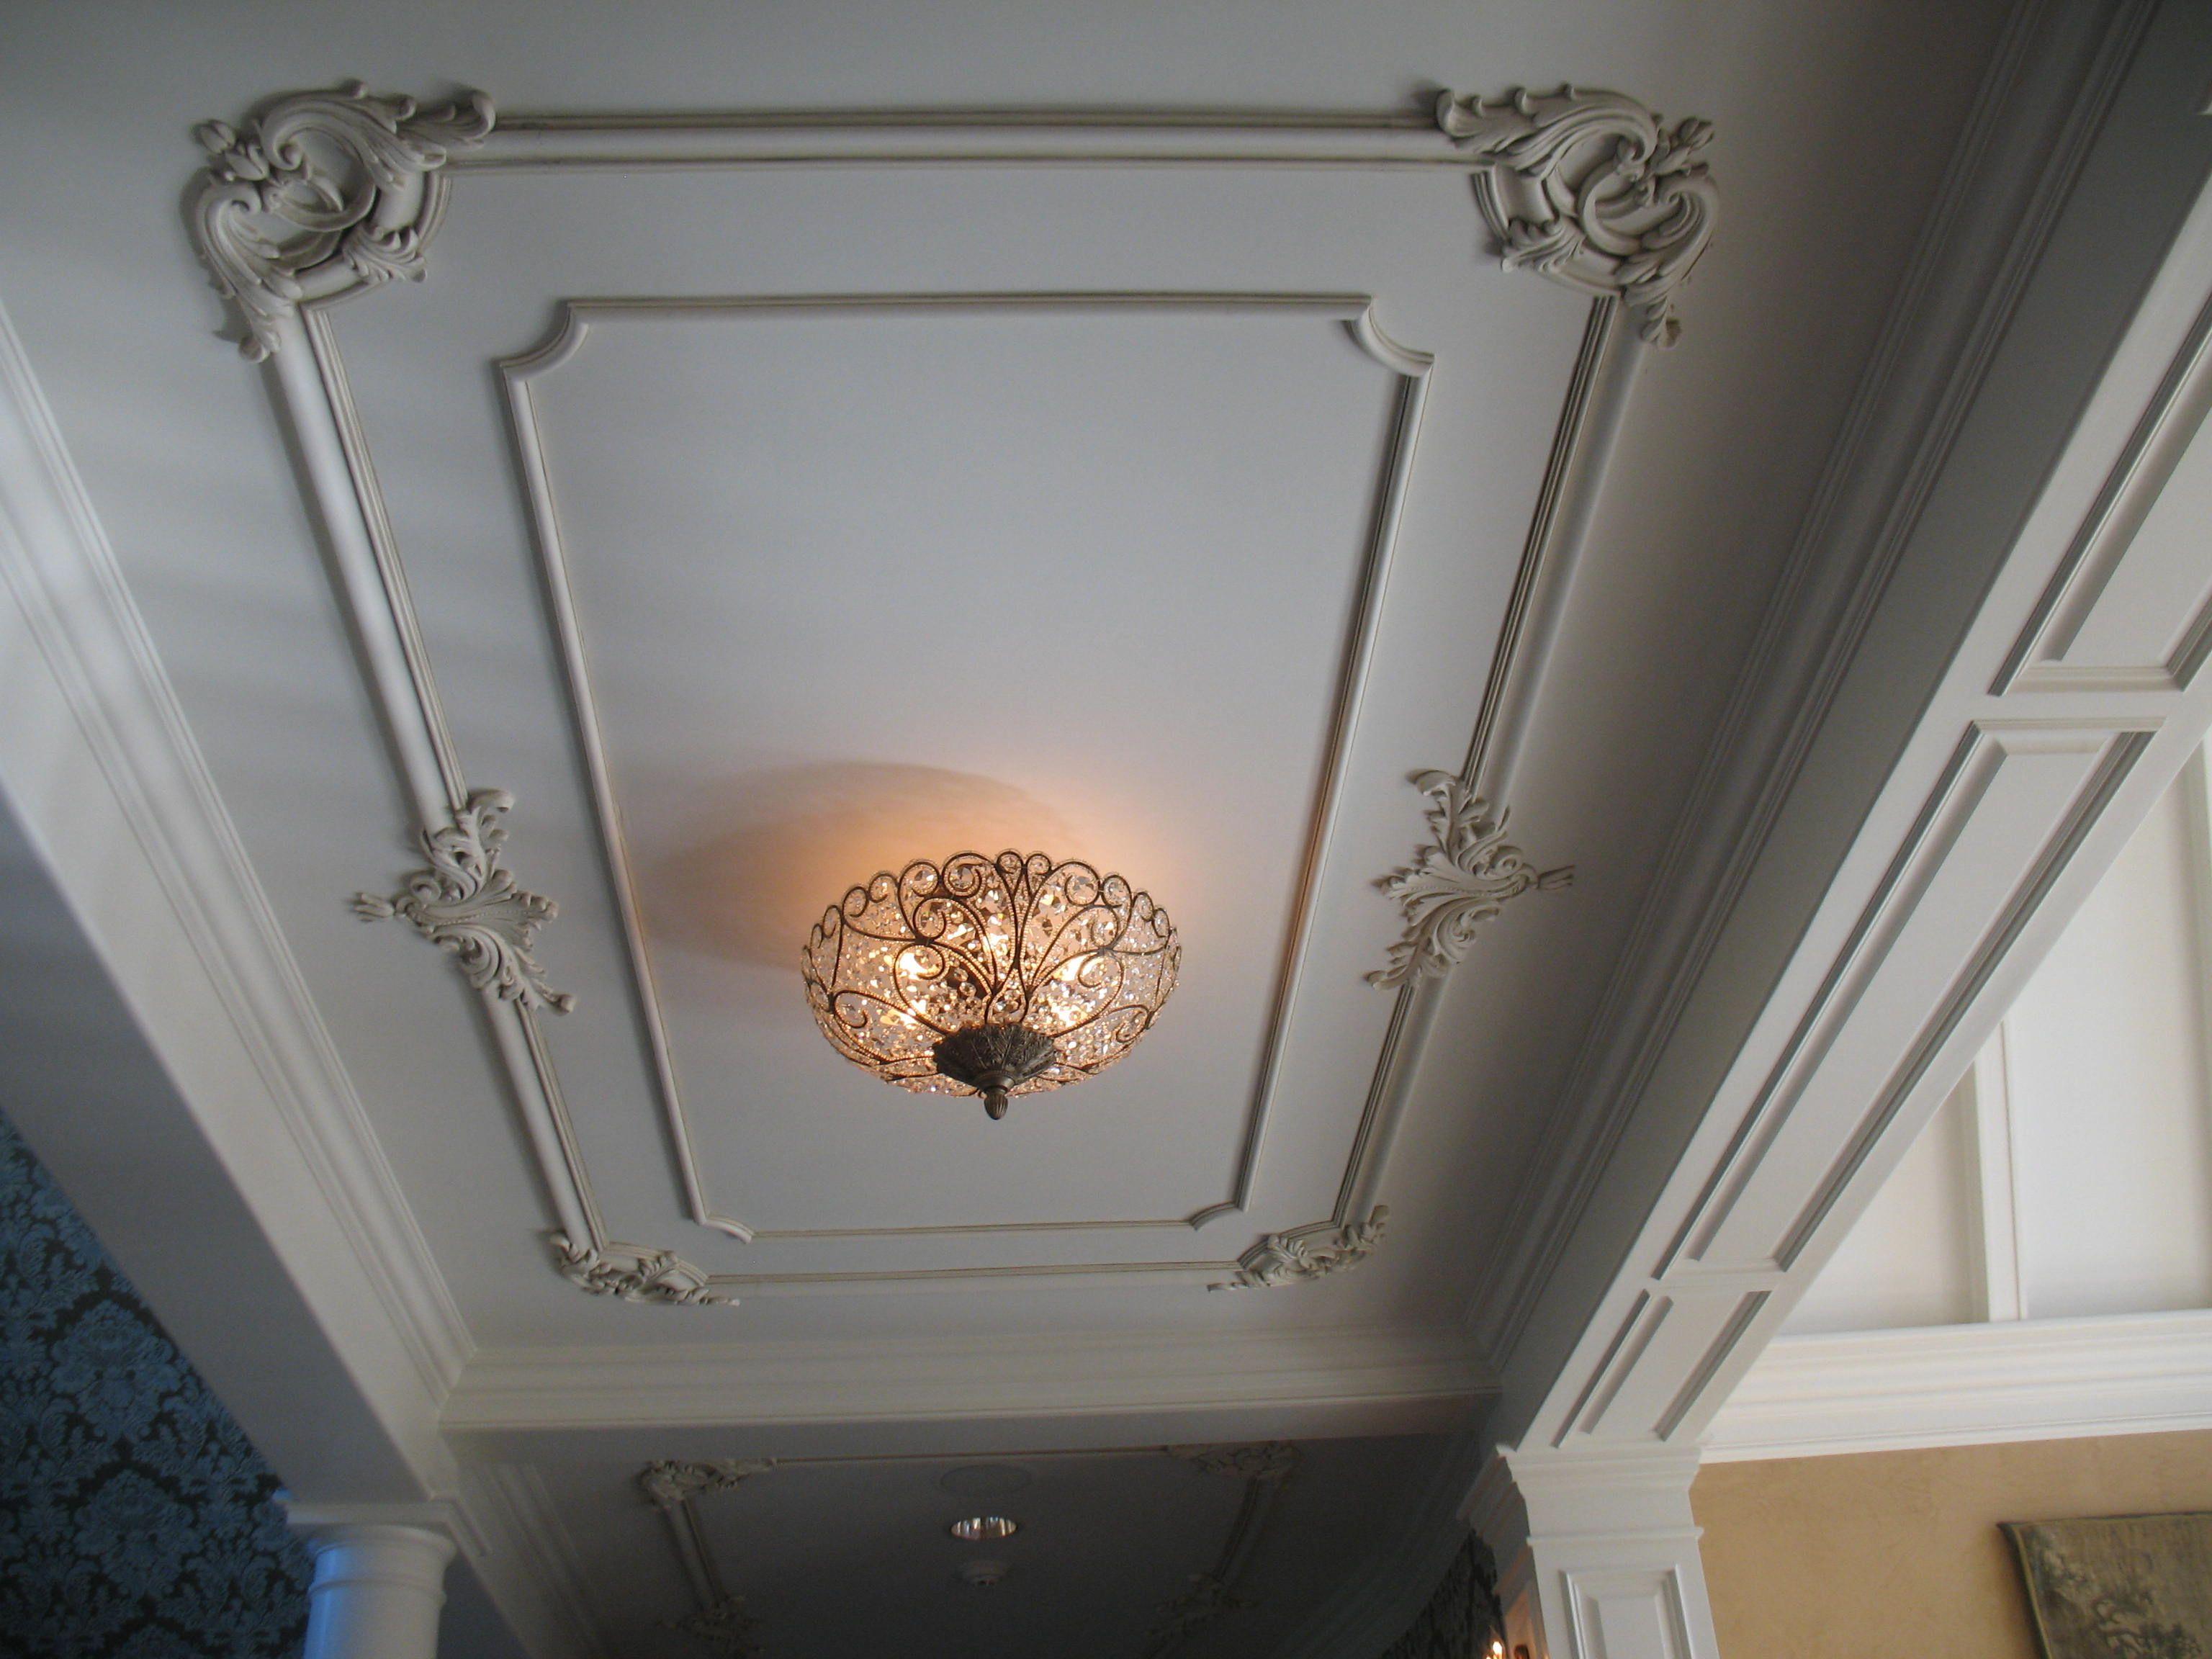 Plaster Period Ceiling-Felber Ornamental | House ceiling ...